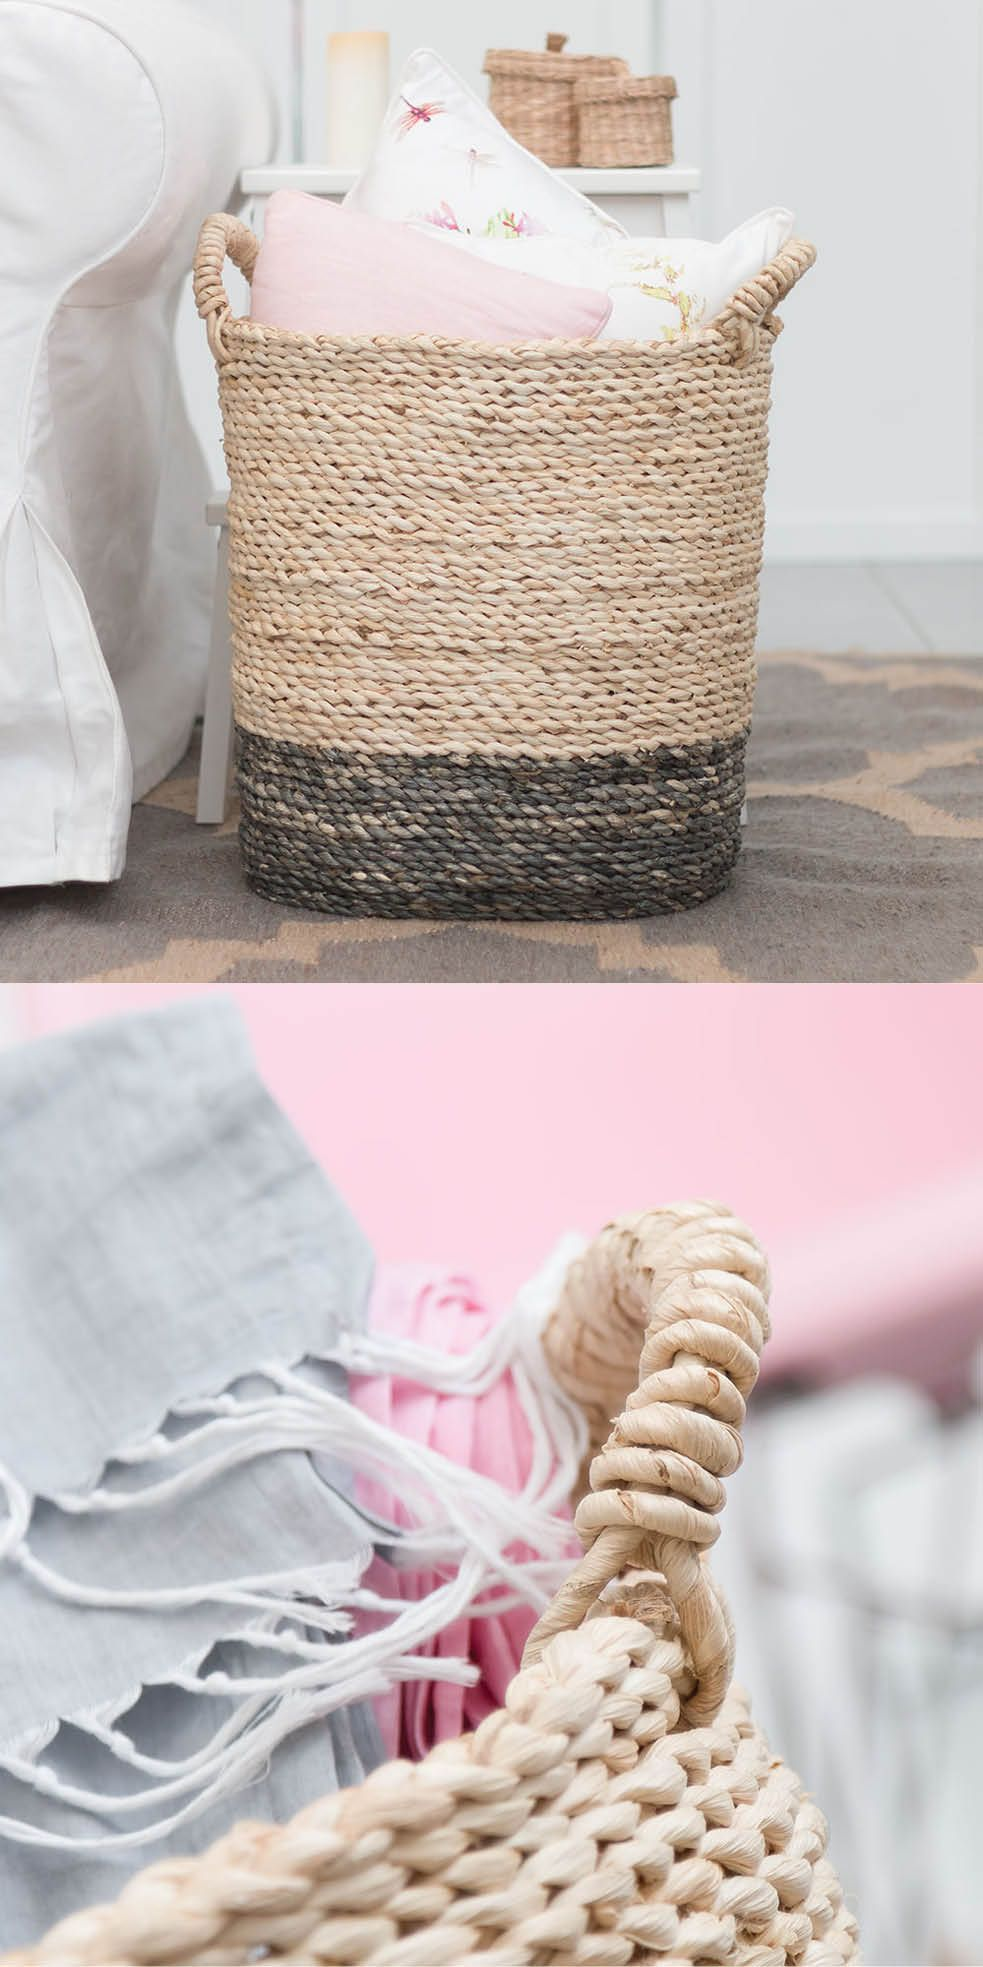 cestas de mimbre - cestas decorativas